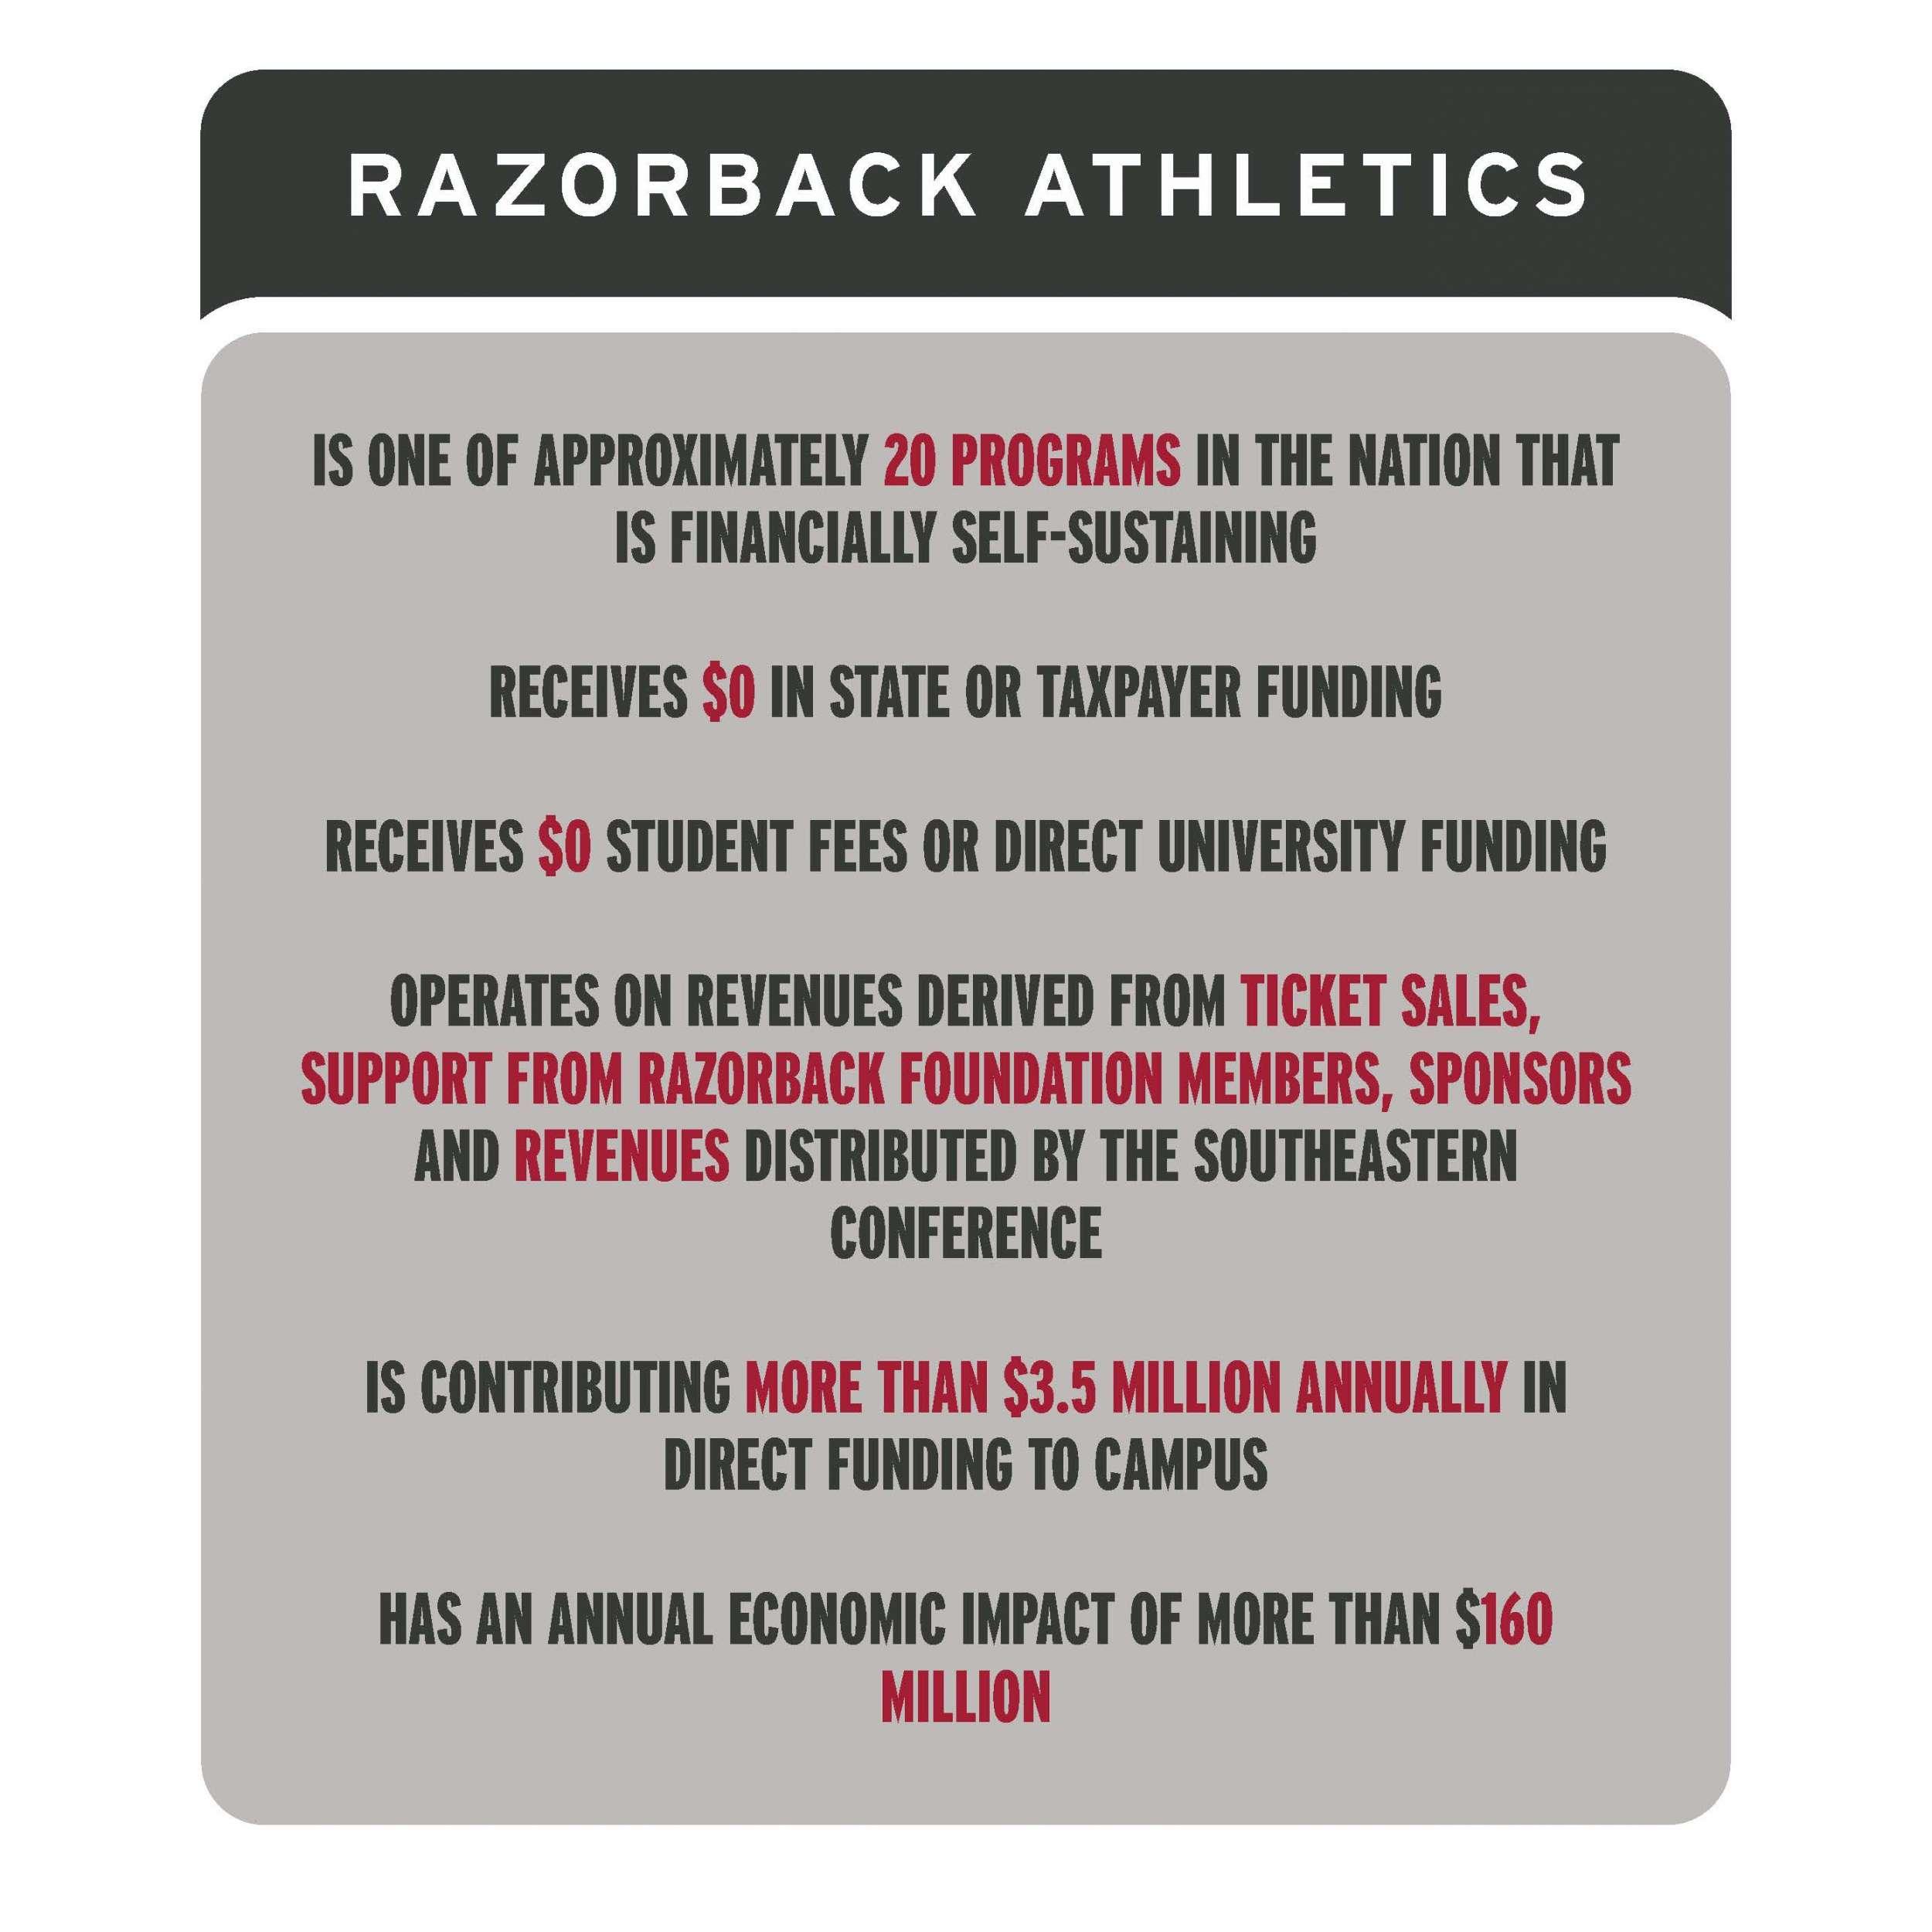 Razorback Athletics